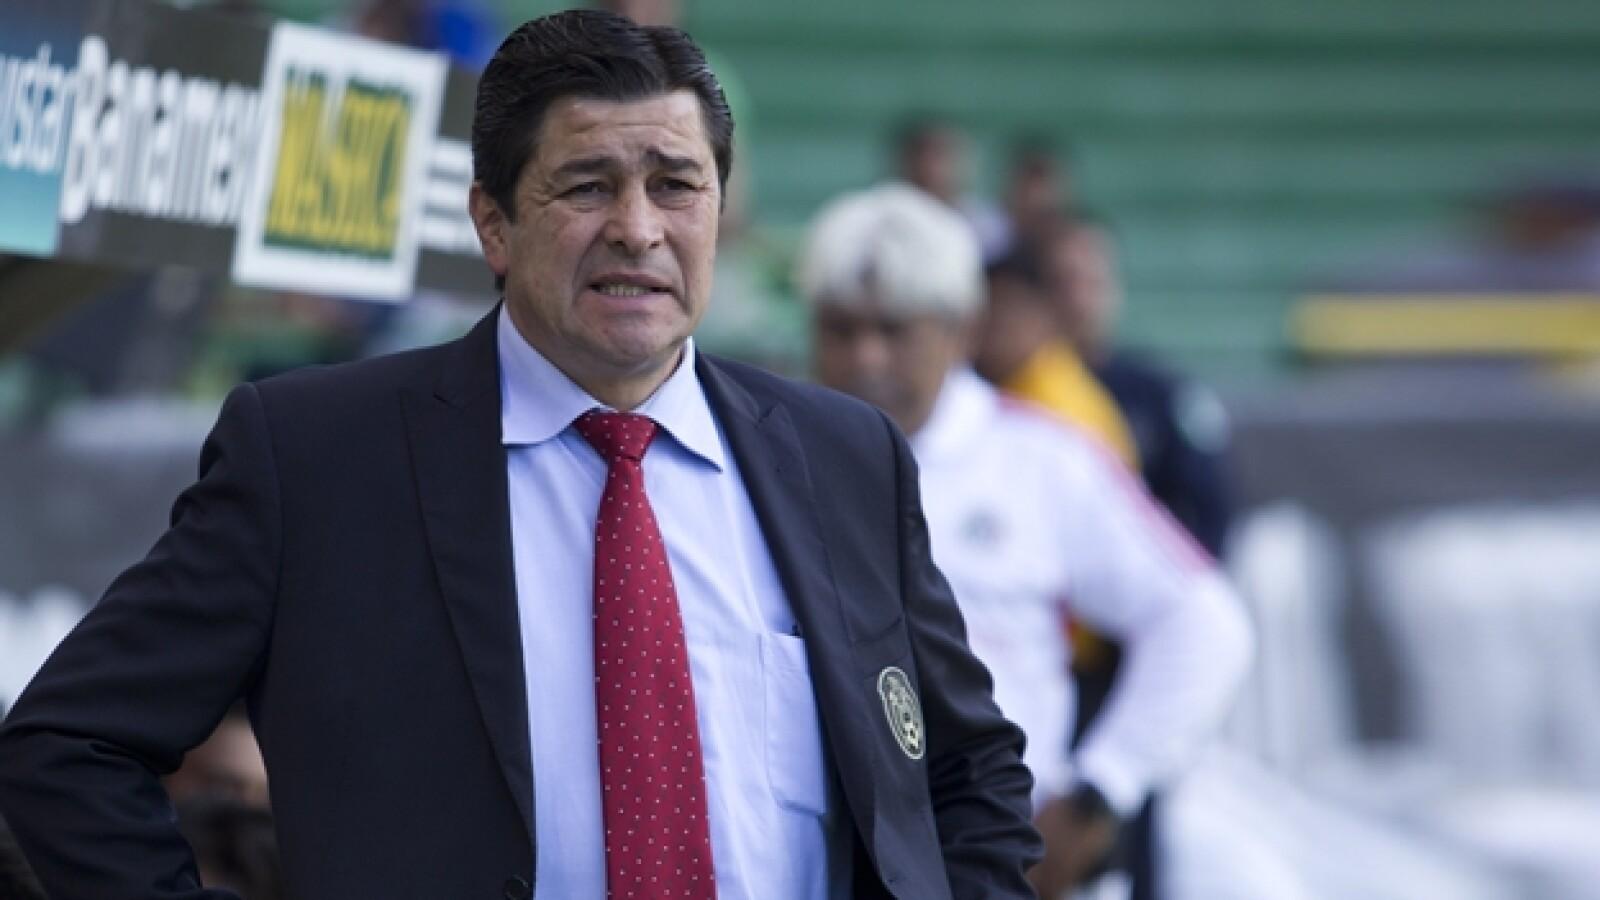 Luis Fernanado Tena